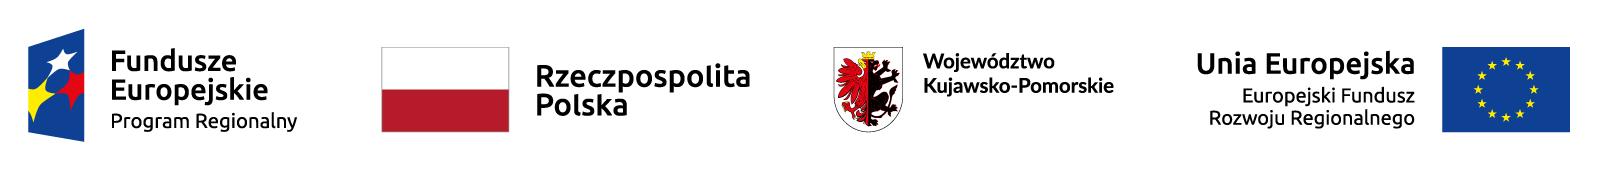 Logotypy UE, PL, RPO, UE